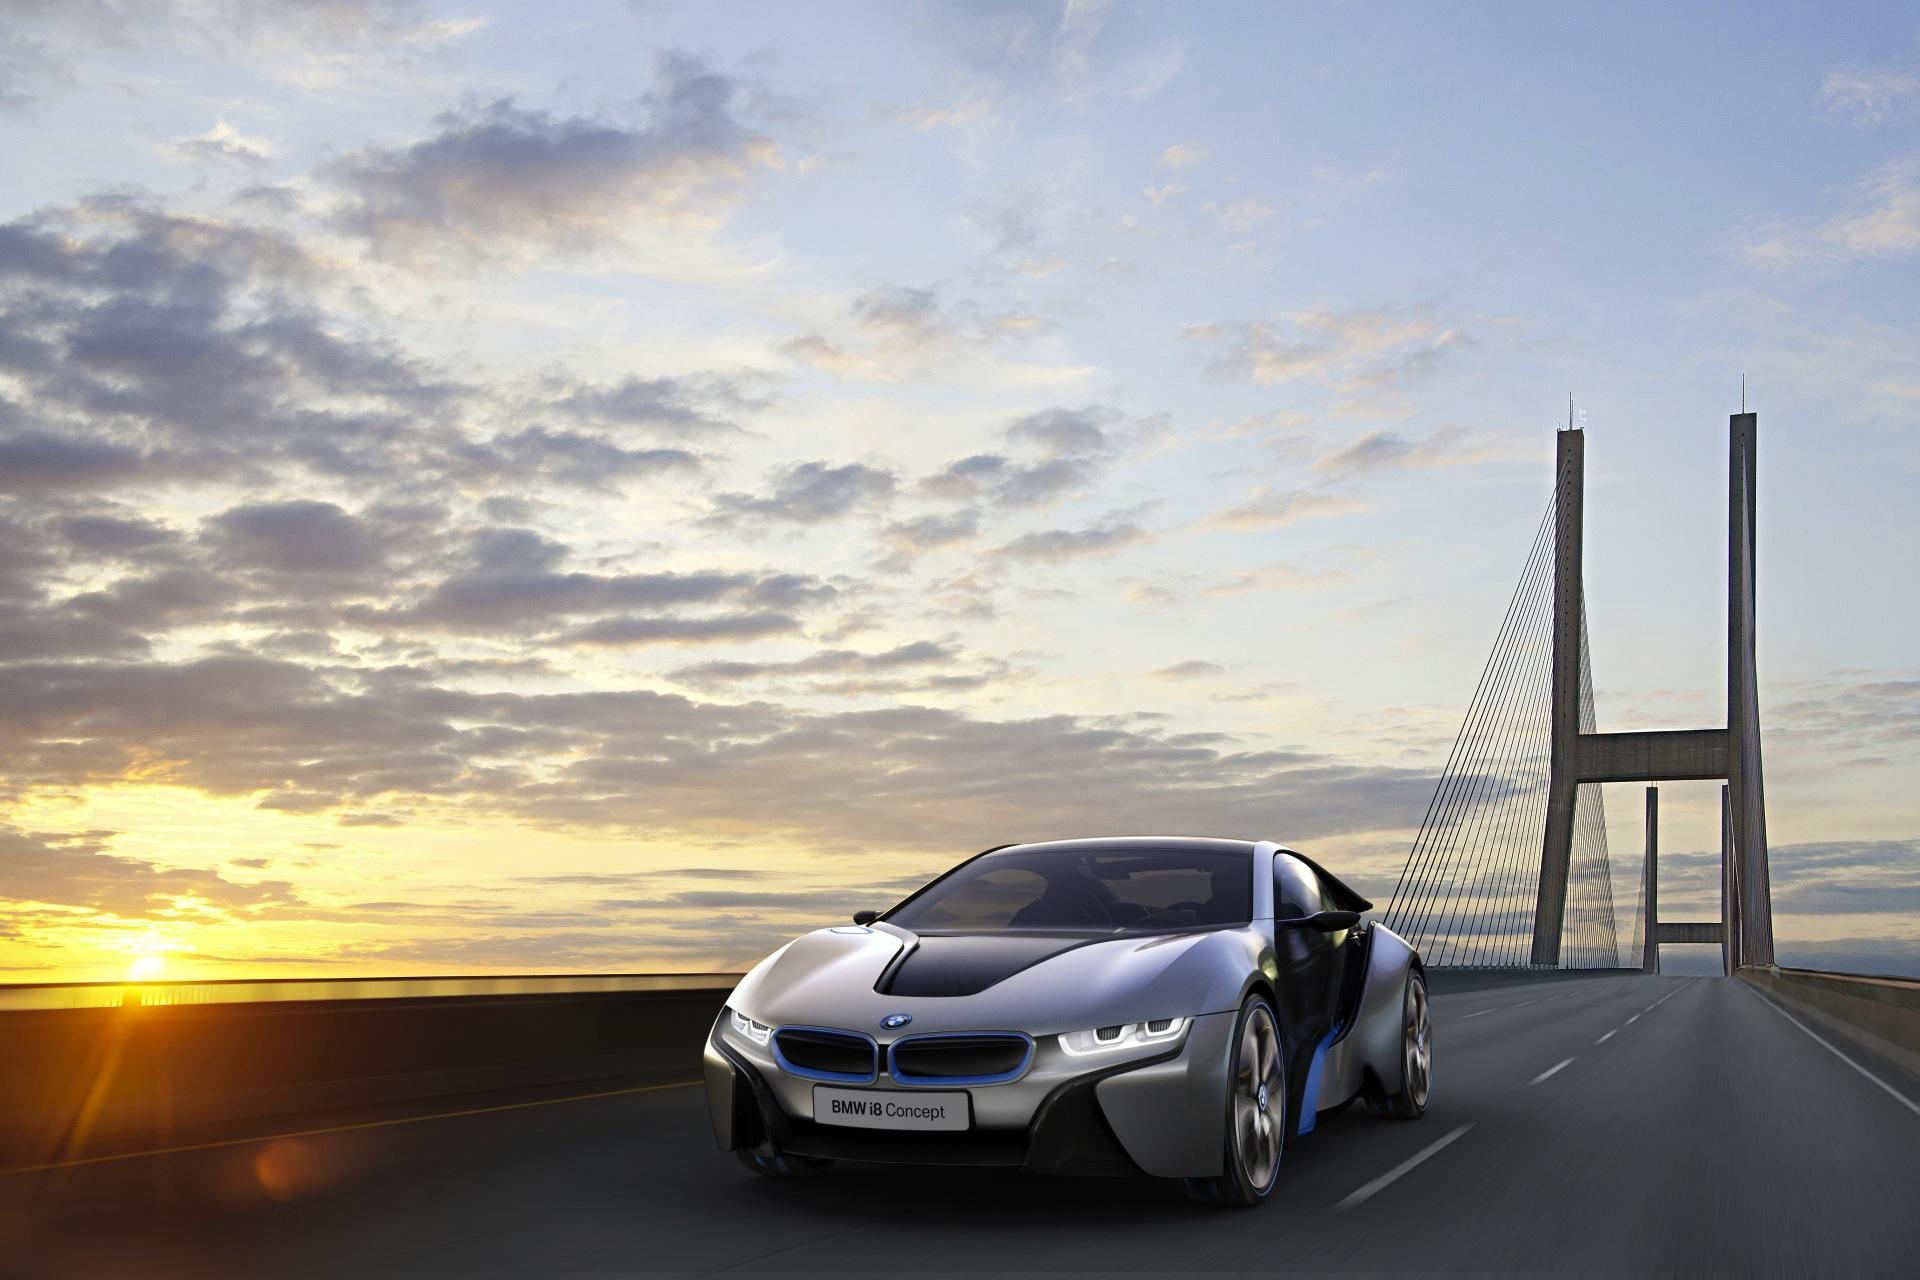 World Debut: BMW i8 Concept 0-60 Under 5 Seconds/78MPG